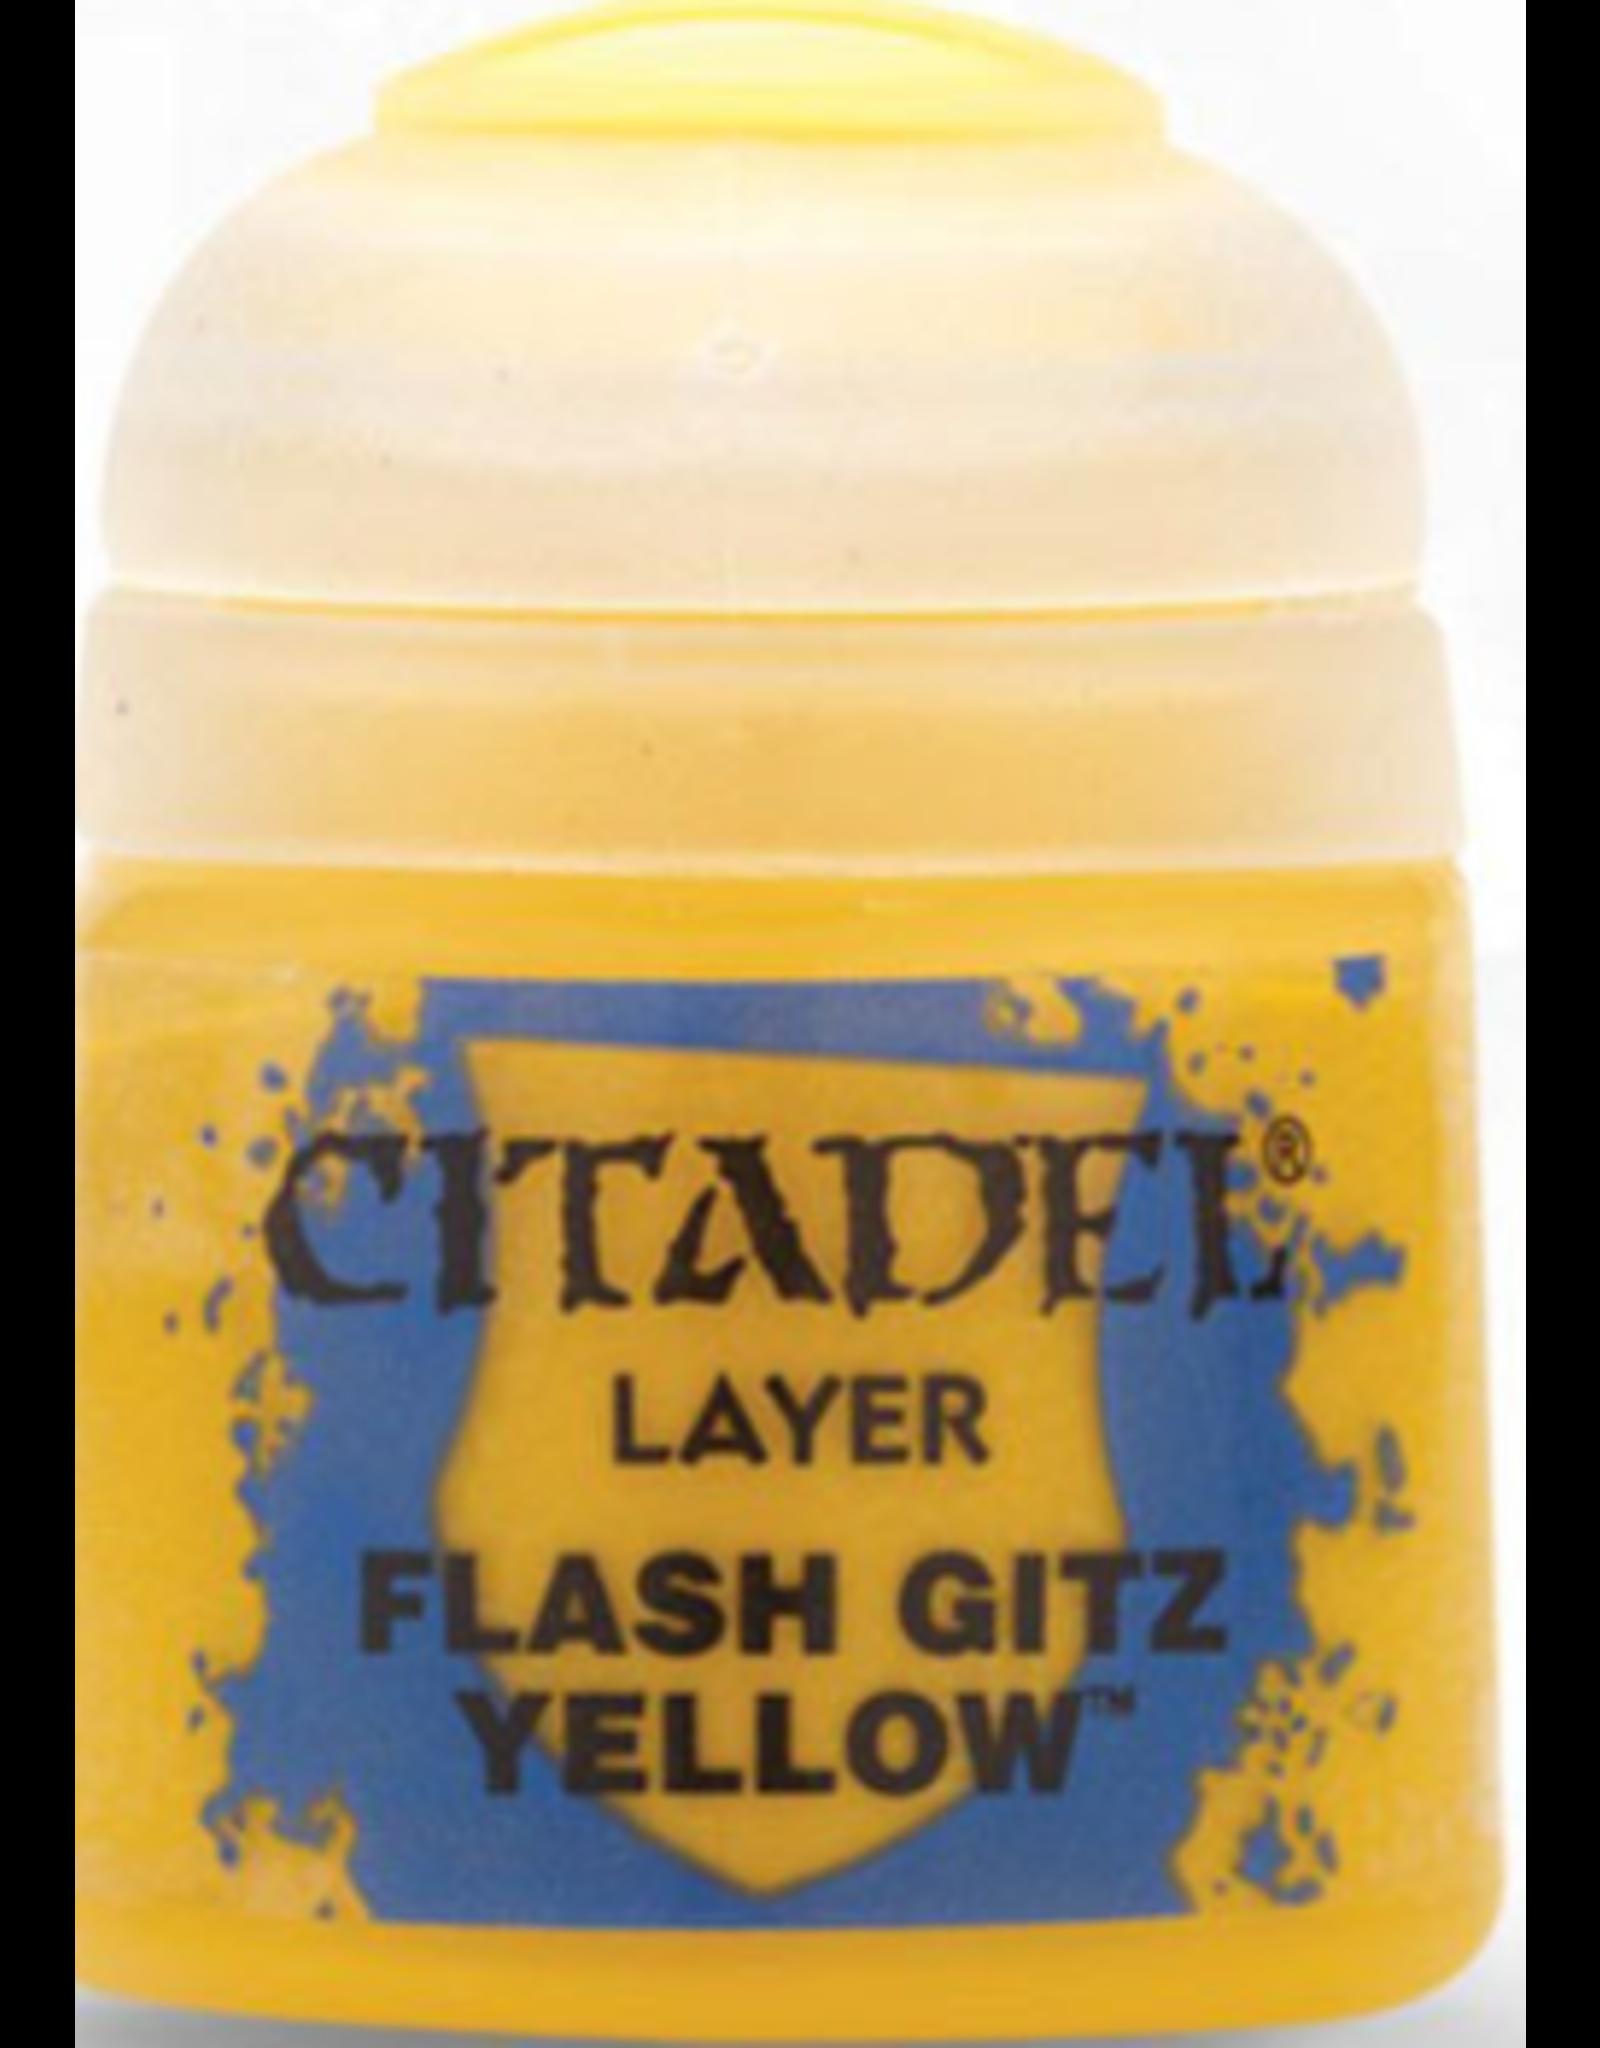 Games Workshop Citadel Layer Flash Gitz Yellow